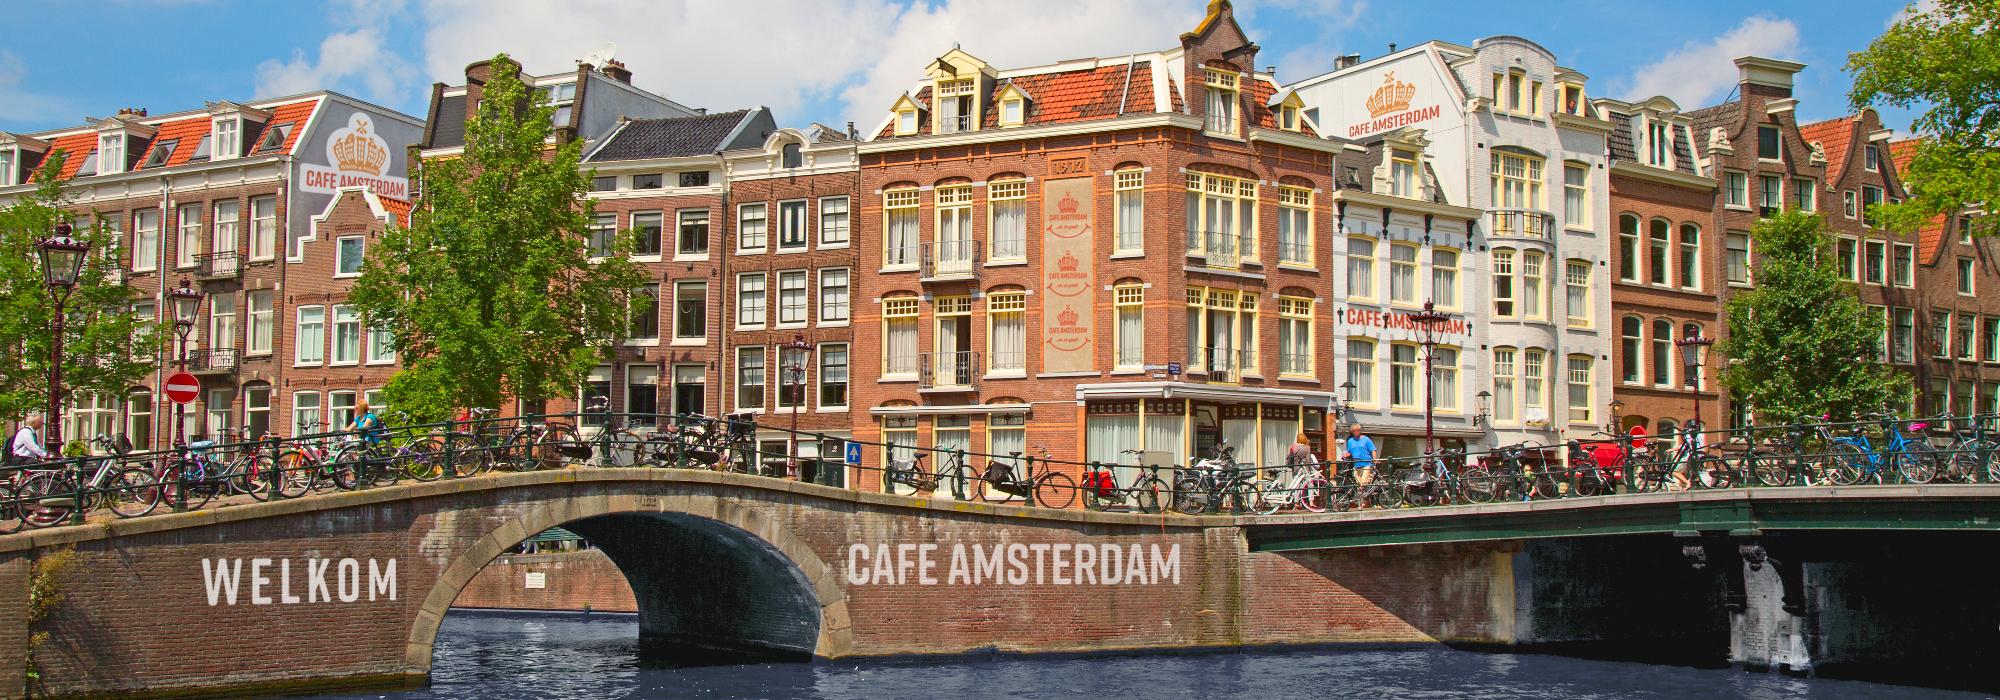 Welkom to Cafe Amsterdam!